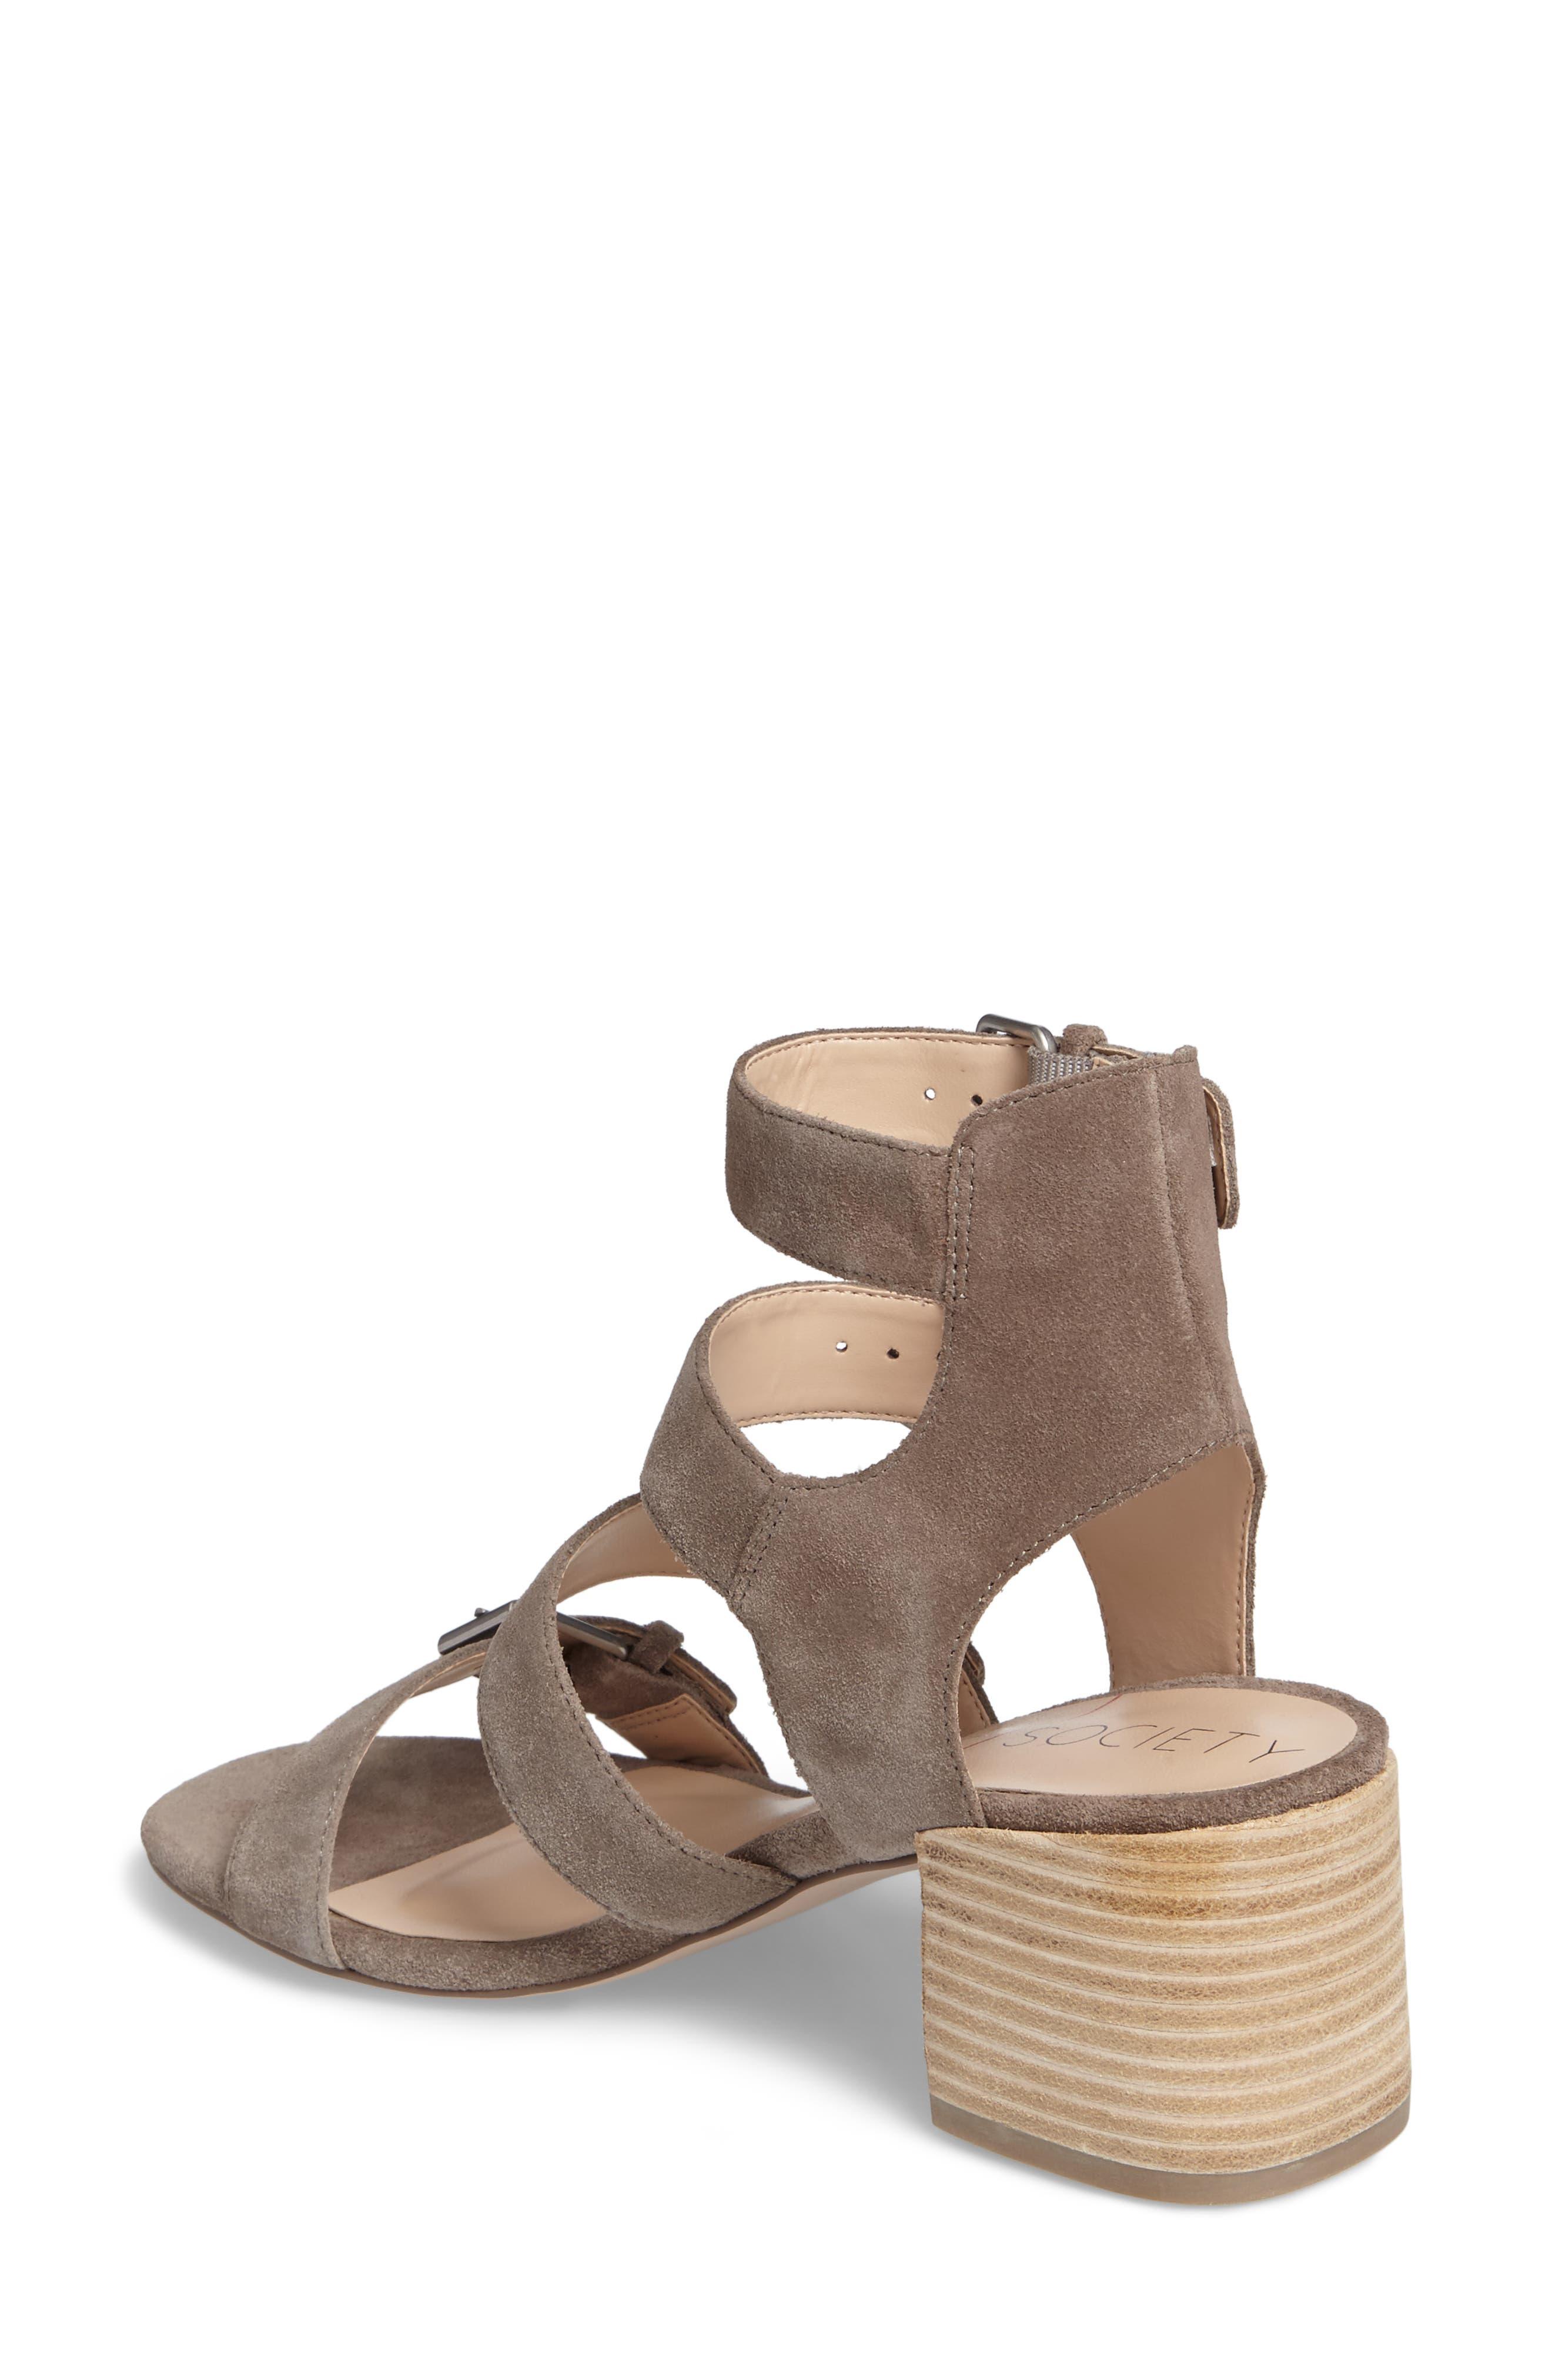 Culver Block Heel Sandal,                             Alternate thumbnail 2, color,                             MUSHROOM SUEDE